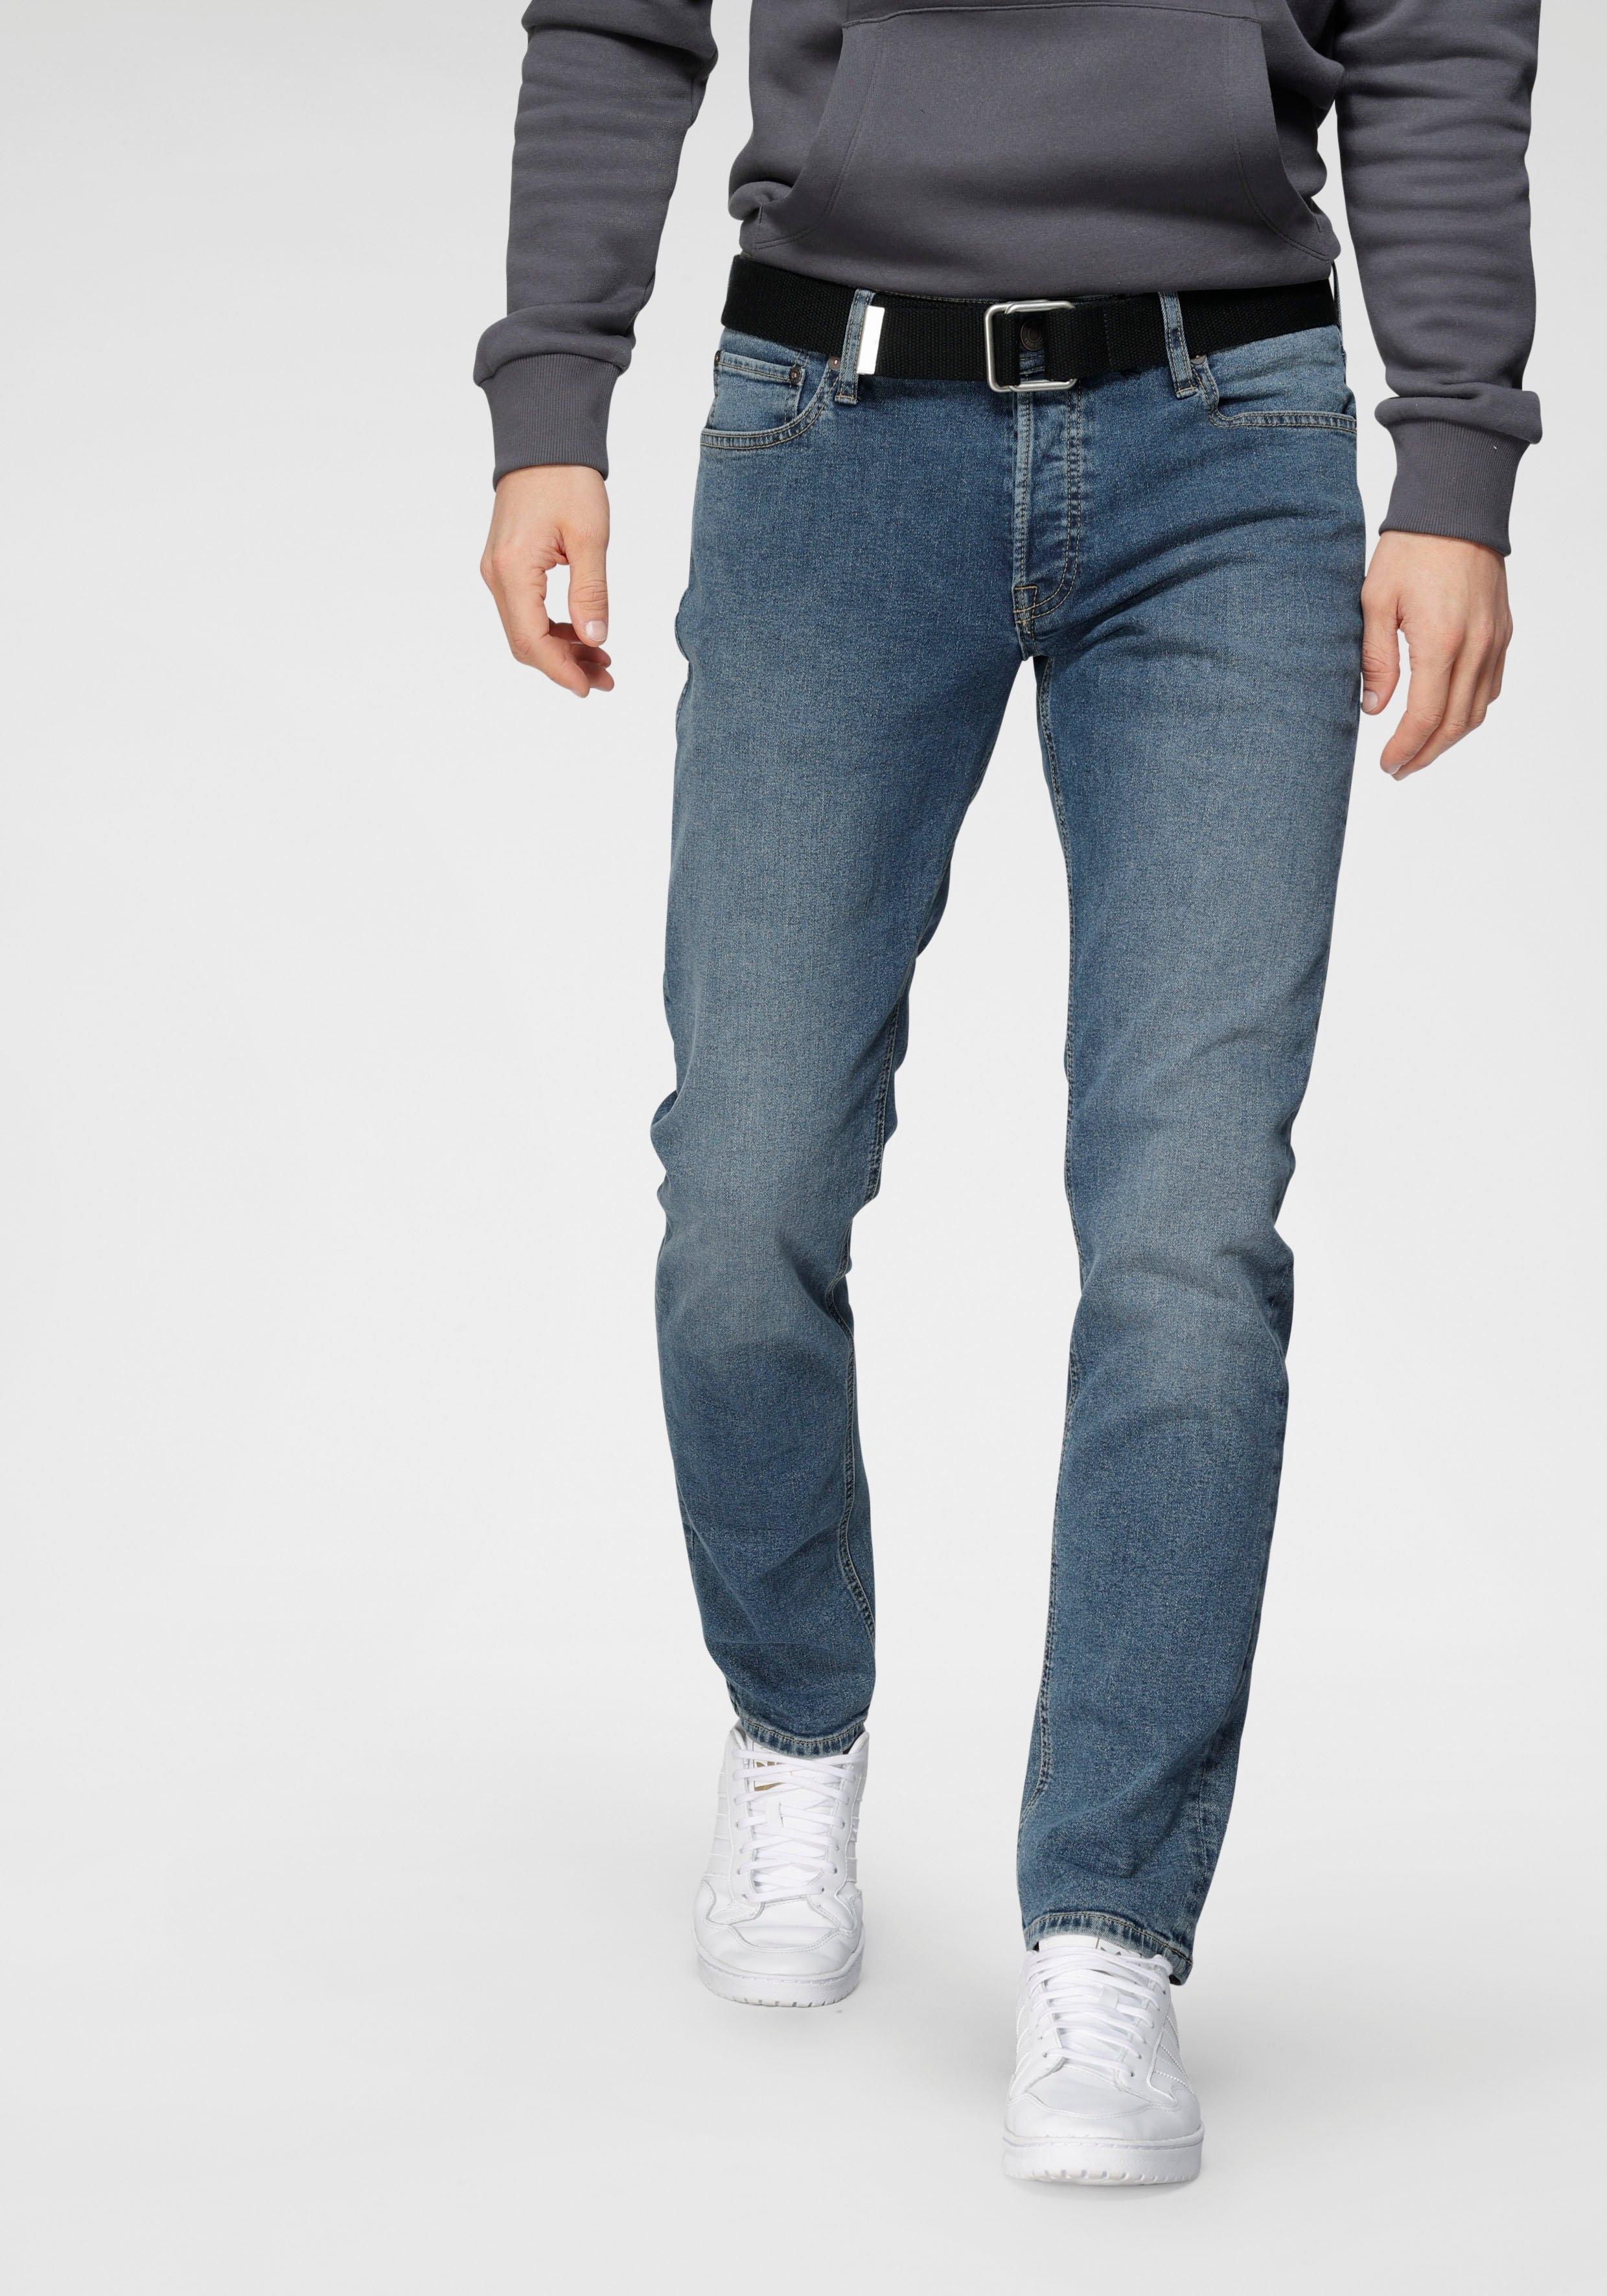 Jack & Jones slim fit jeans GLENN voordelig en veilig online kopen